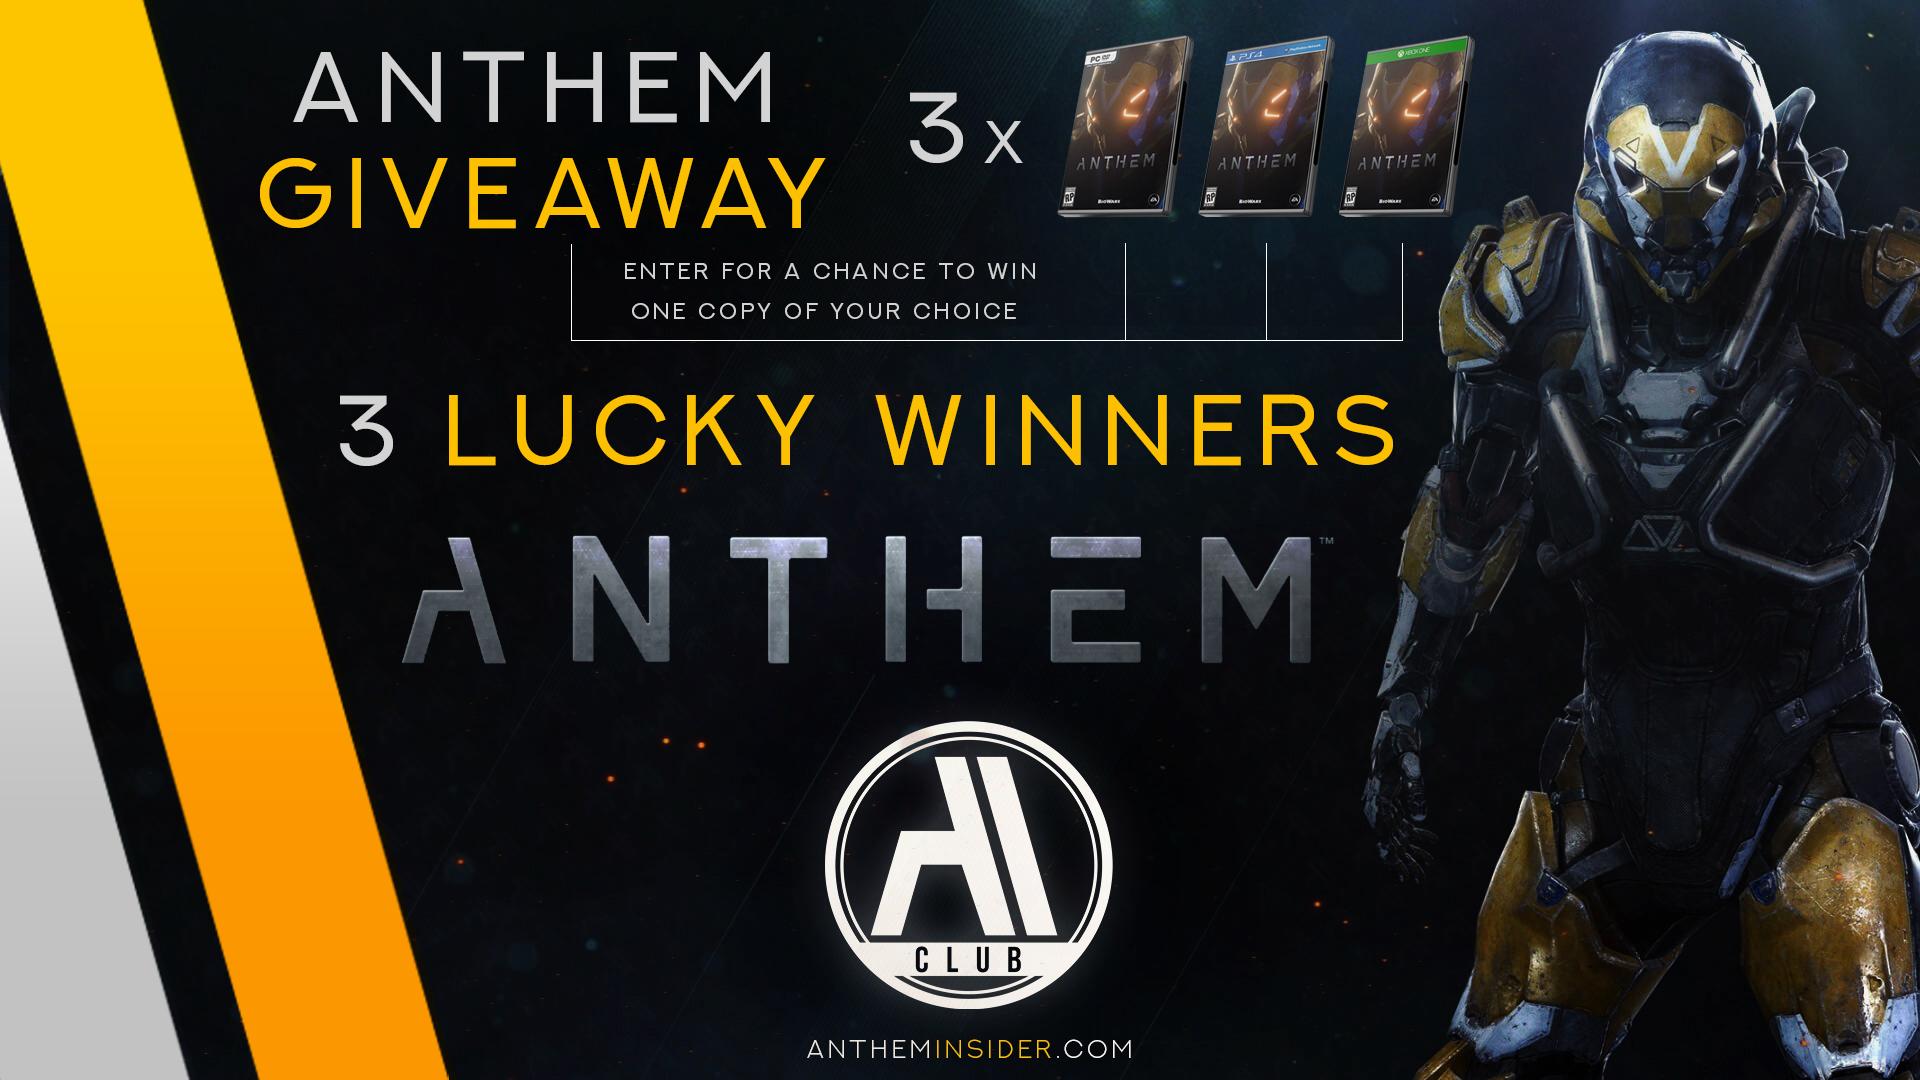 Anthem Game Giveaway 3 Digital Copies Sponsored By Anthem Insider Ai Club Anthem Game Game Giveaway Anthem